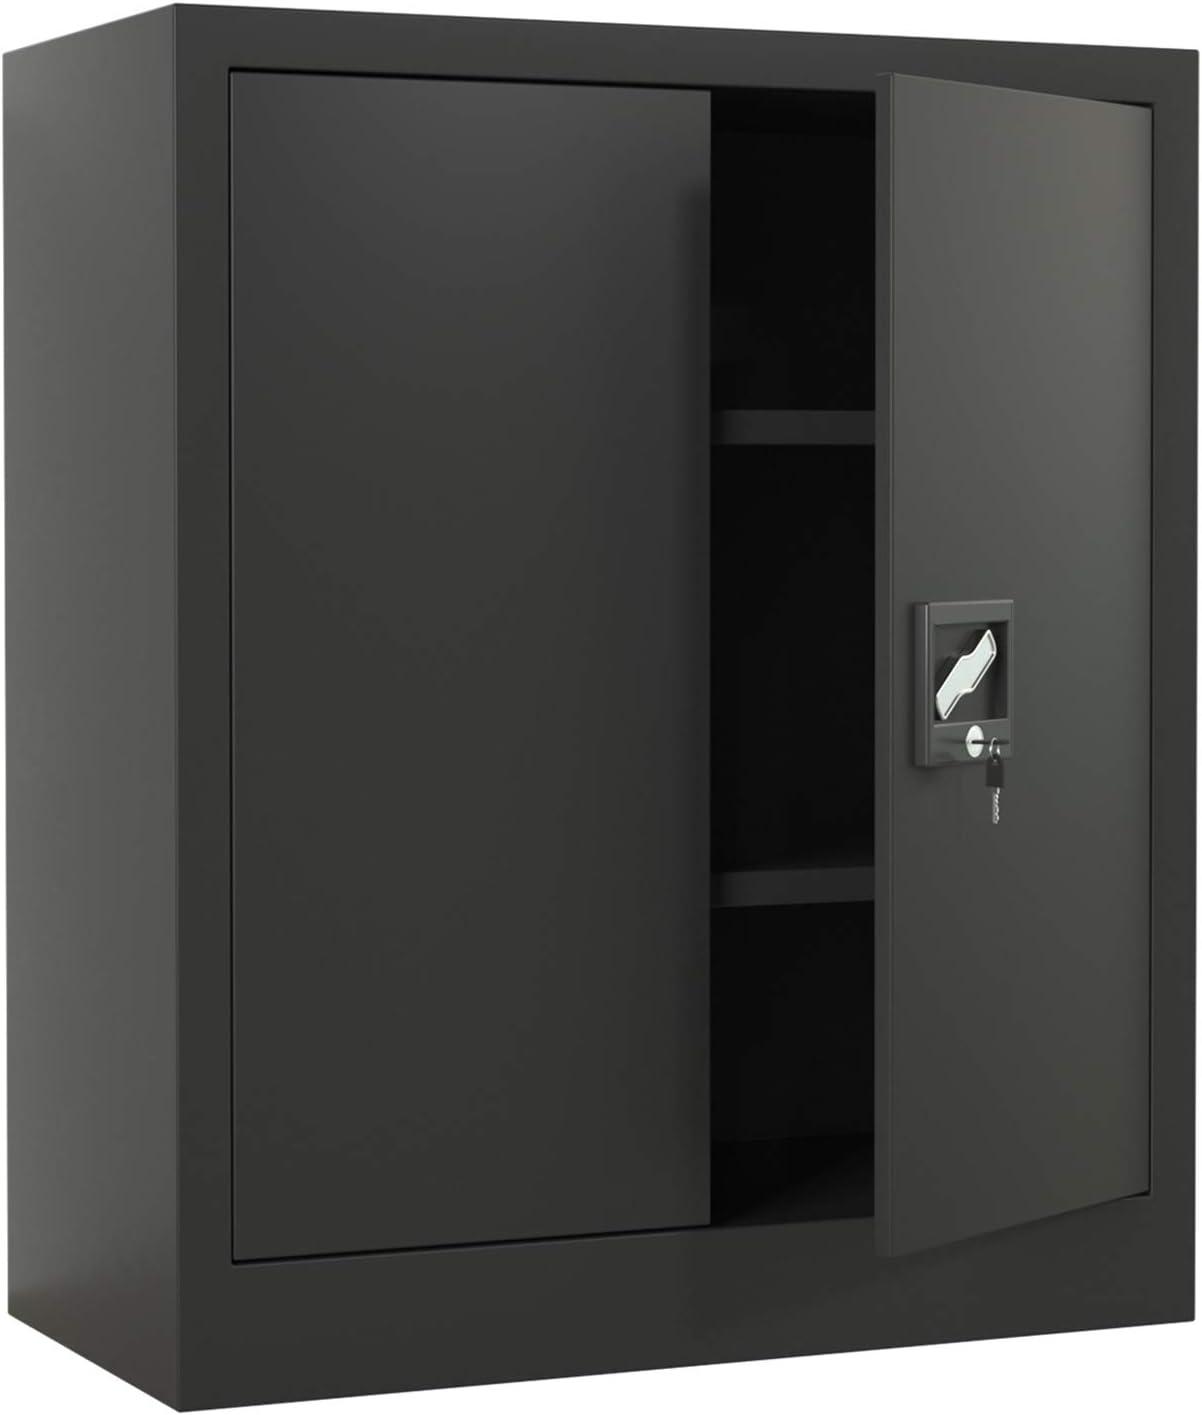 iJINGUR Large Latest item discharge sale Metal Storage Cabinet with Height Locking Doors 2 Adju